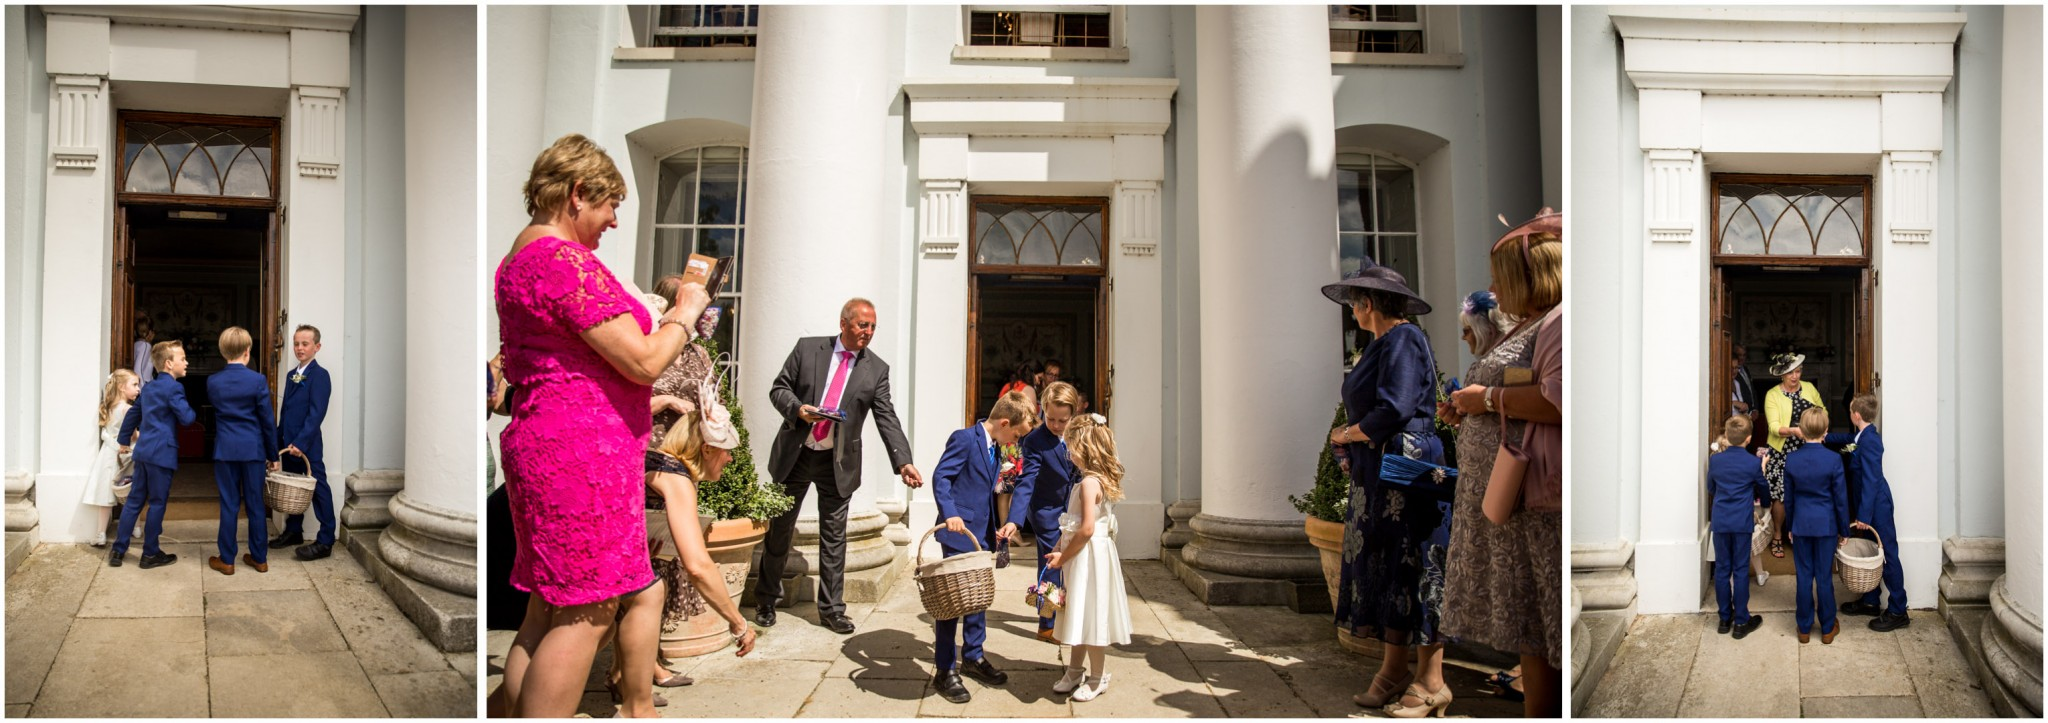 Avington Park Wedding Preparing to throw confetti